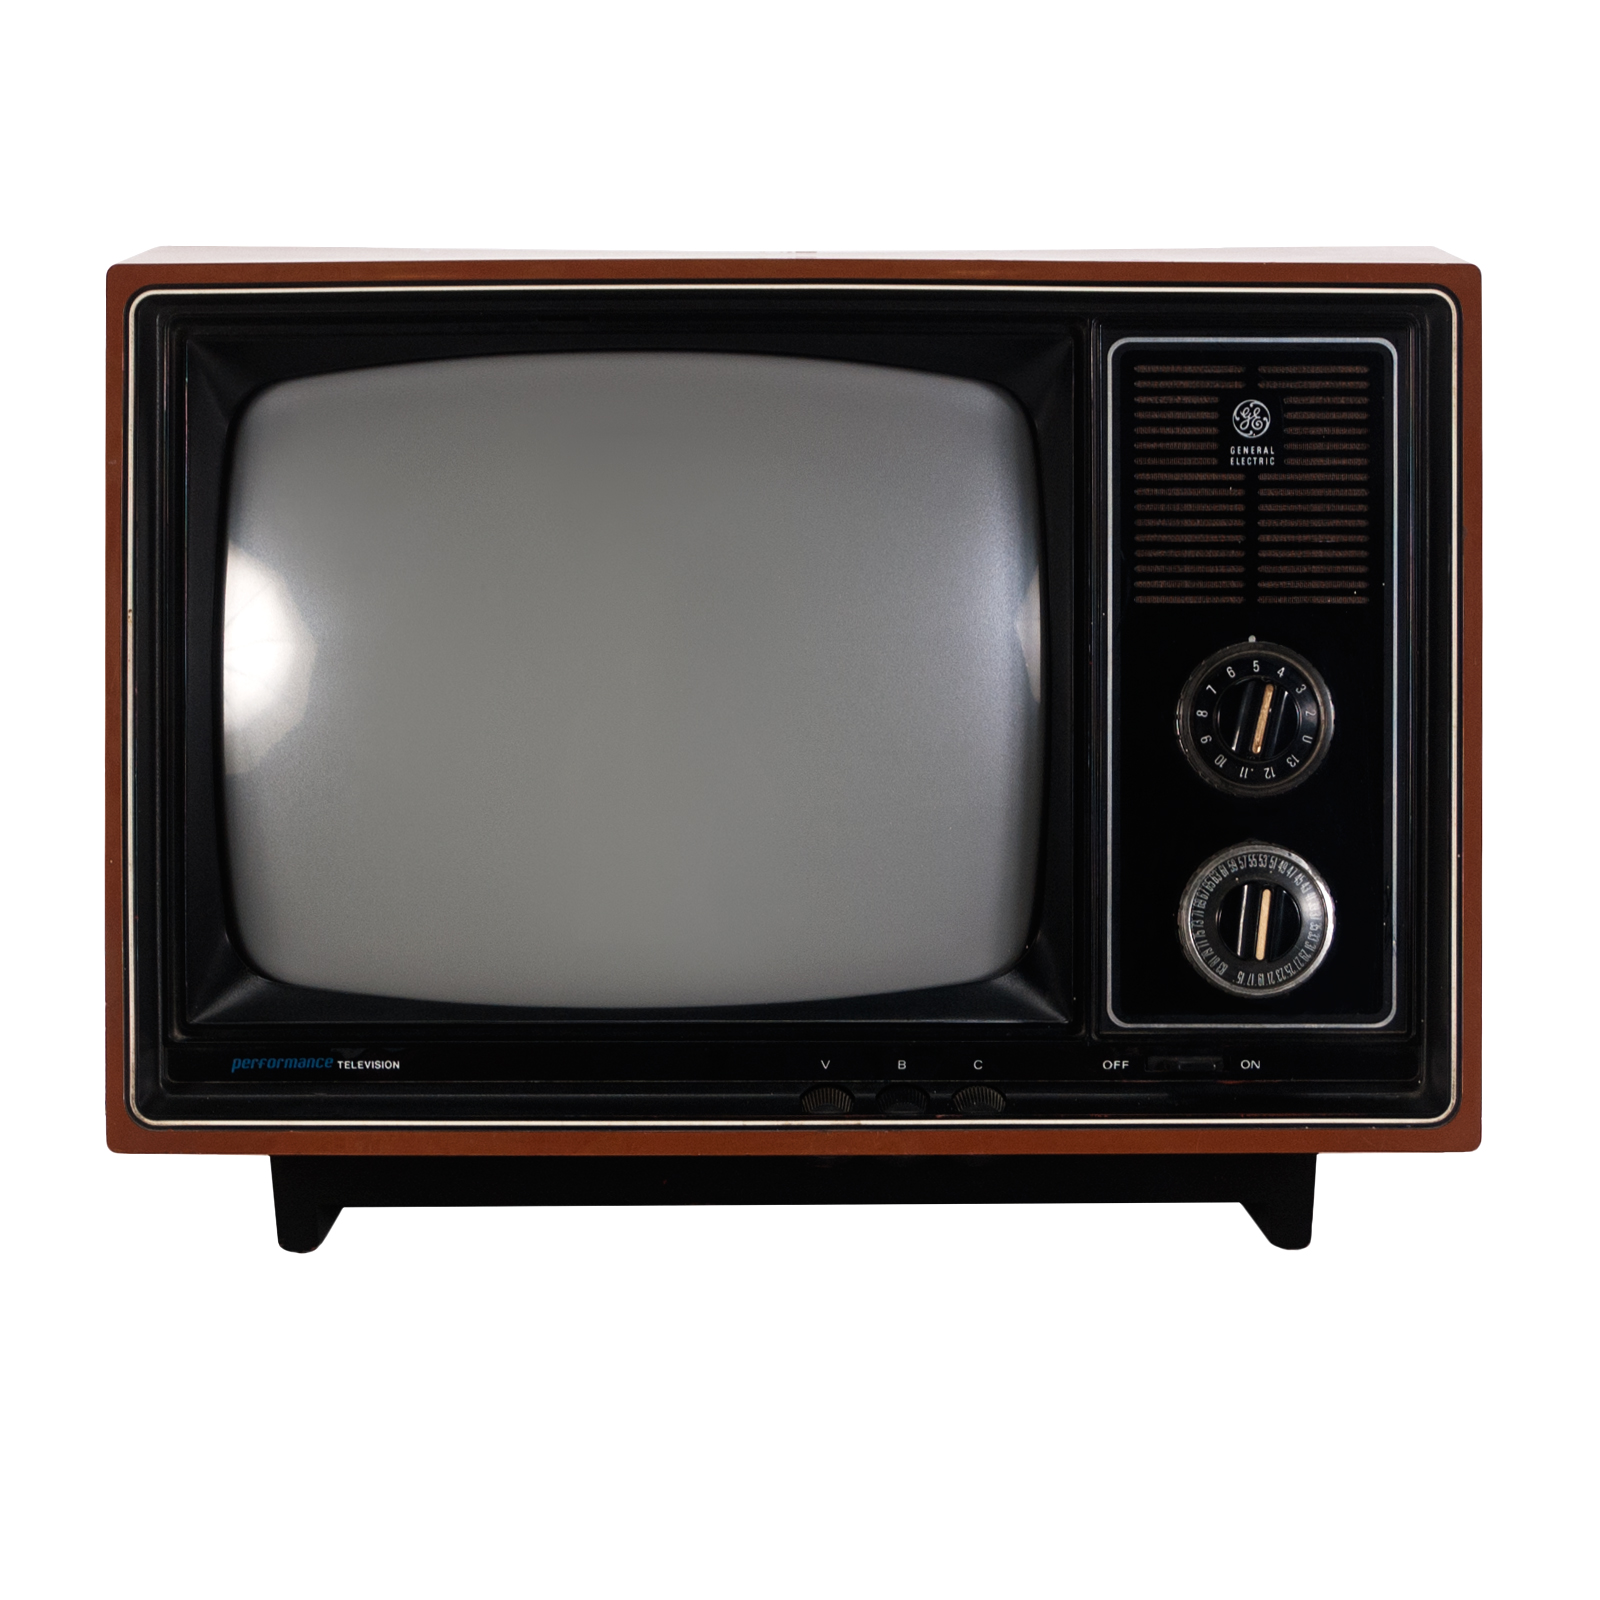 1970s GE Television Rental | Event Decor Rental | Delivery